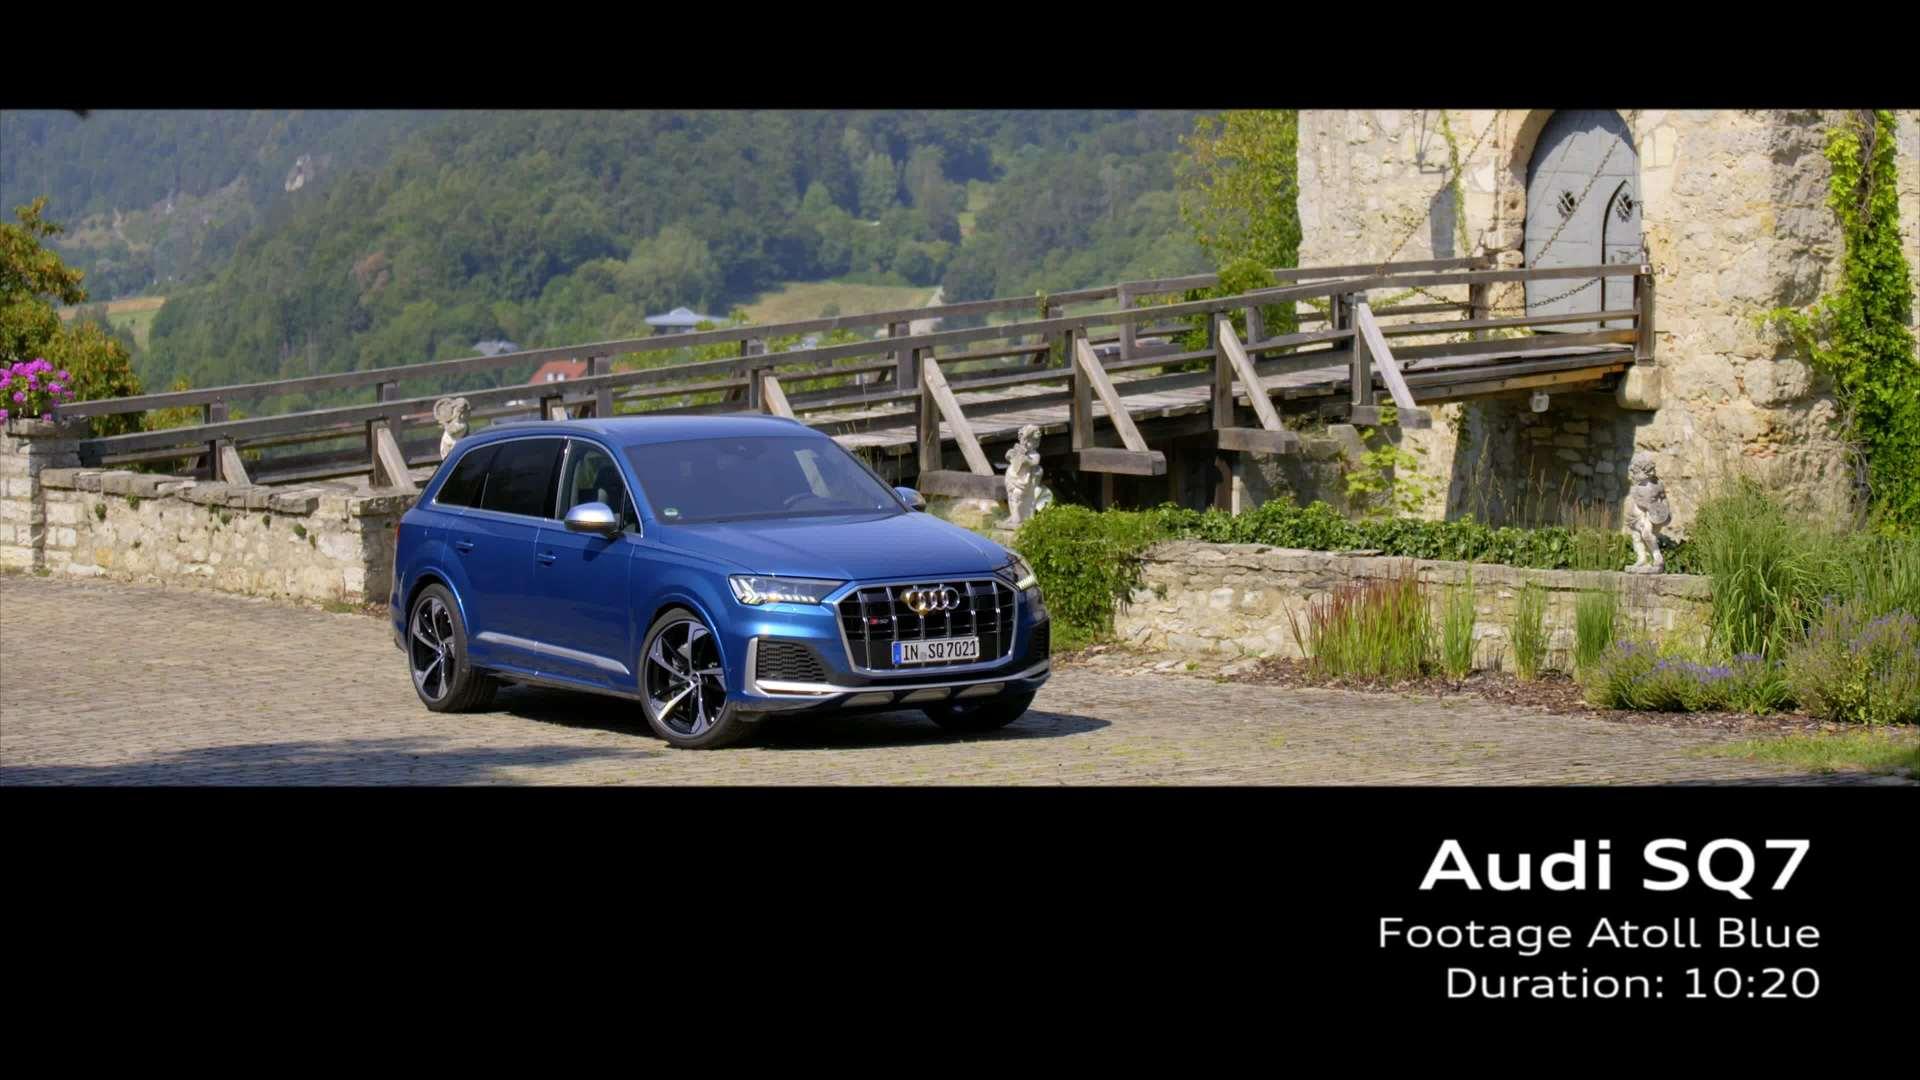 Footage: Audi SQ7